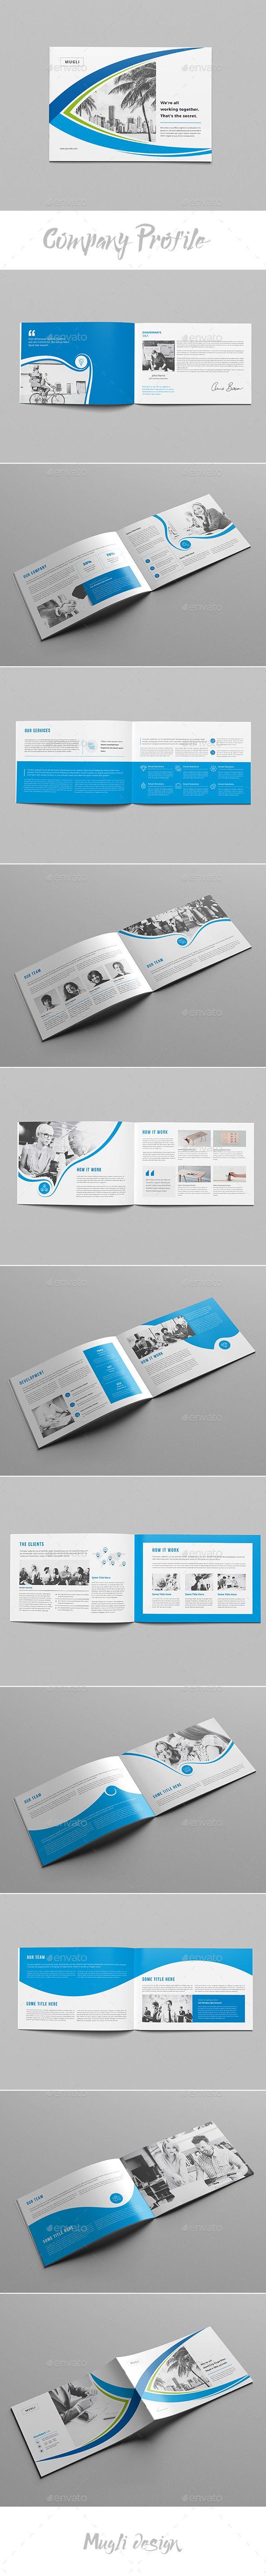 Company Profile Brochure Template InDesign INDD | Company Profile ...